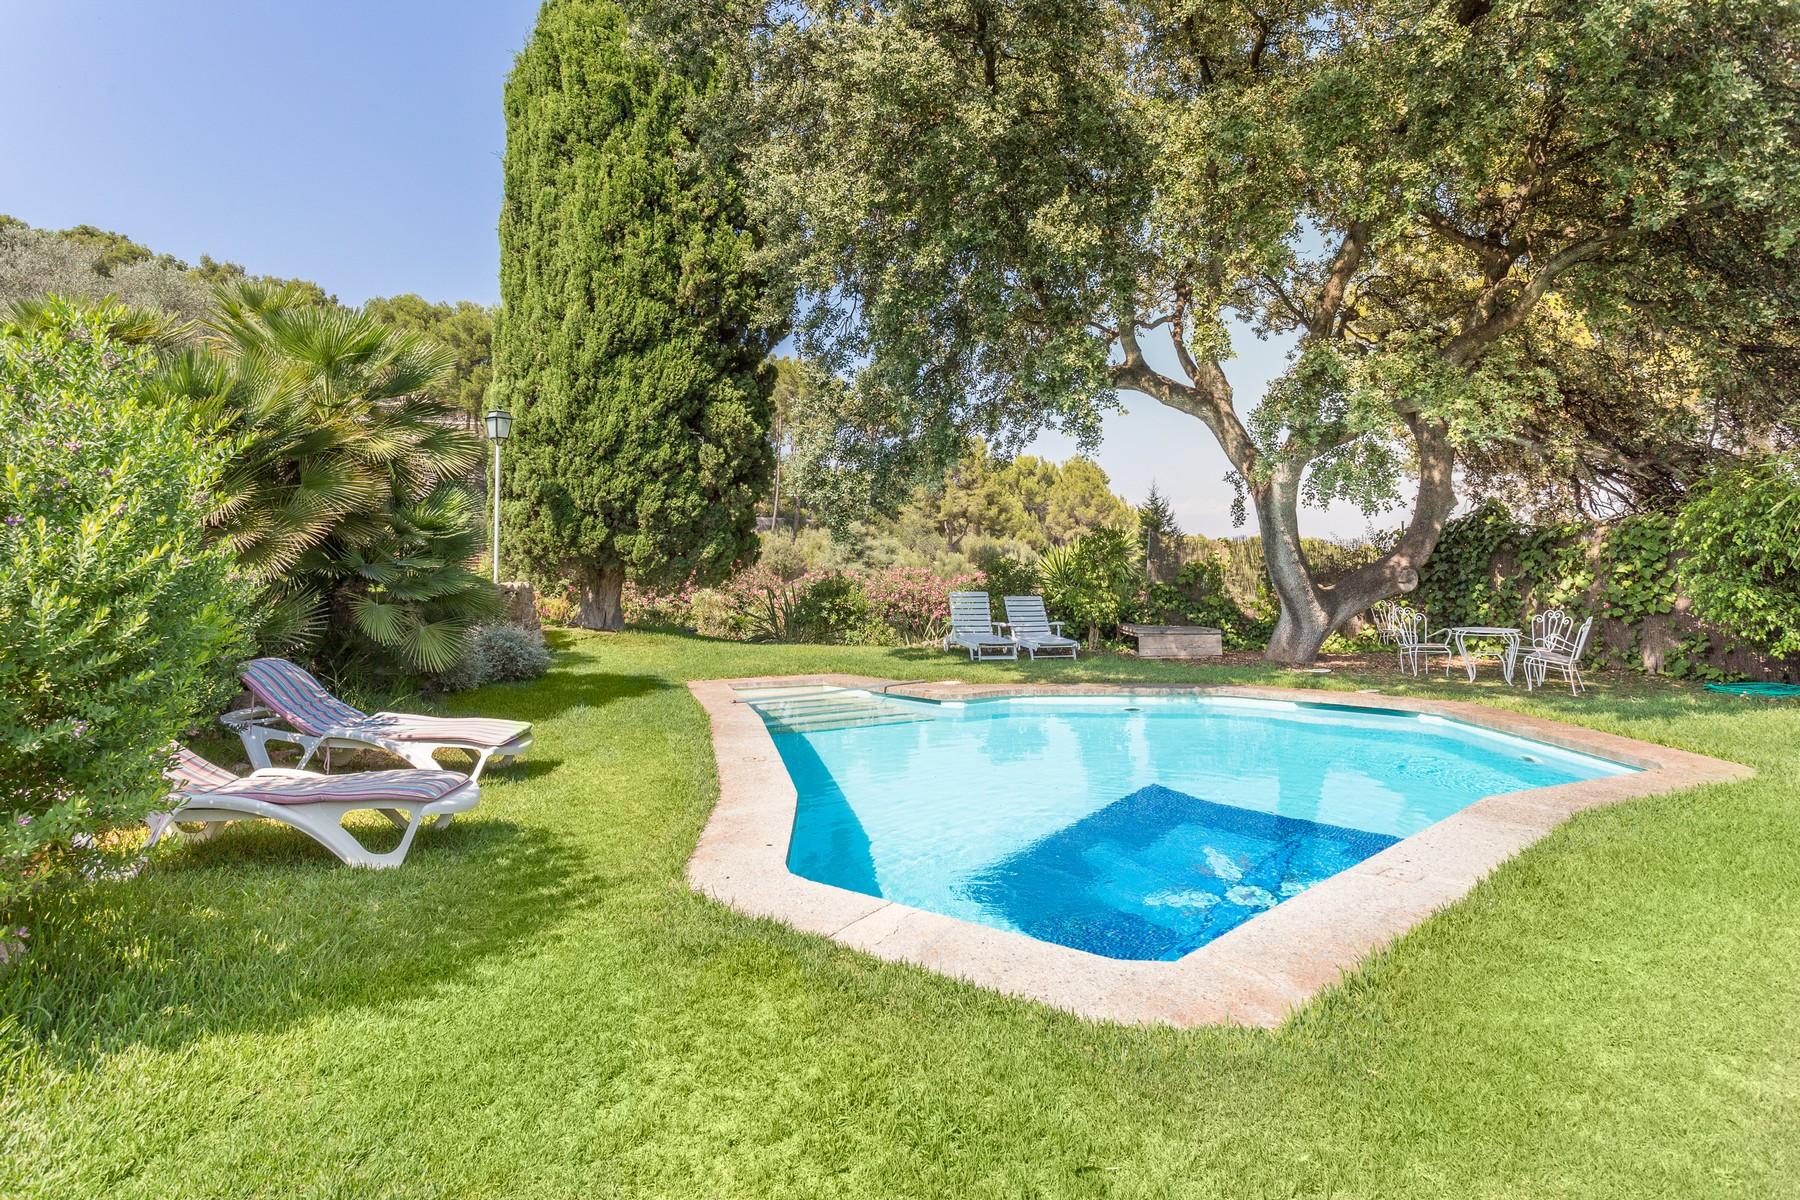 獨棟家庭住宅 為 出售 在 Grand Villa with swimming pool in Son Vida Palma, 馬婁卡, 07013 西班牙